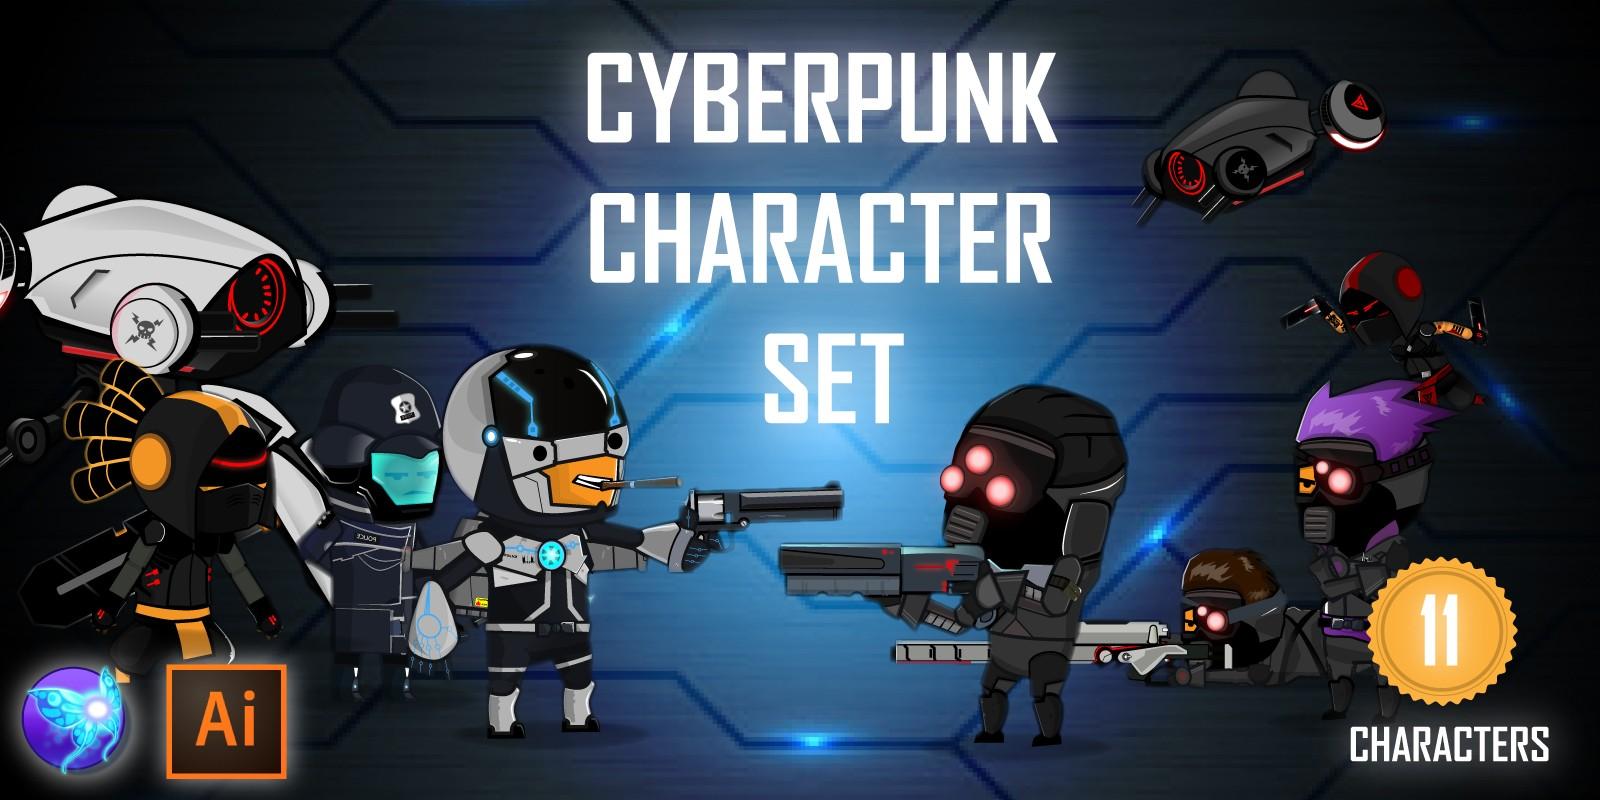 Cyberpunk Game Character Sprites